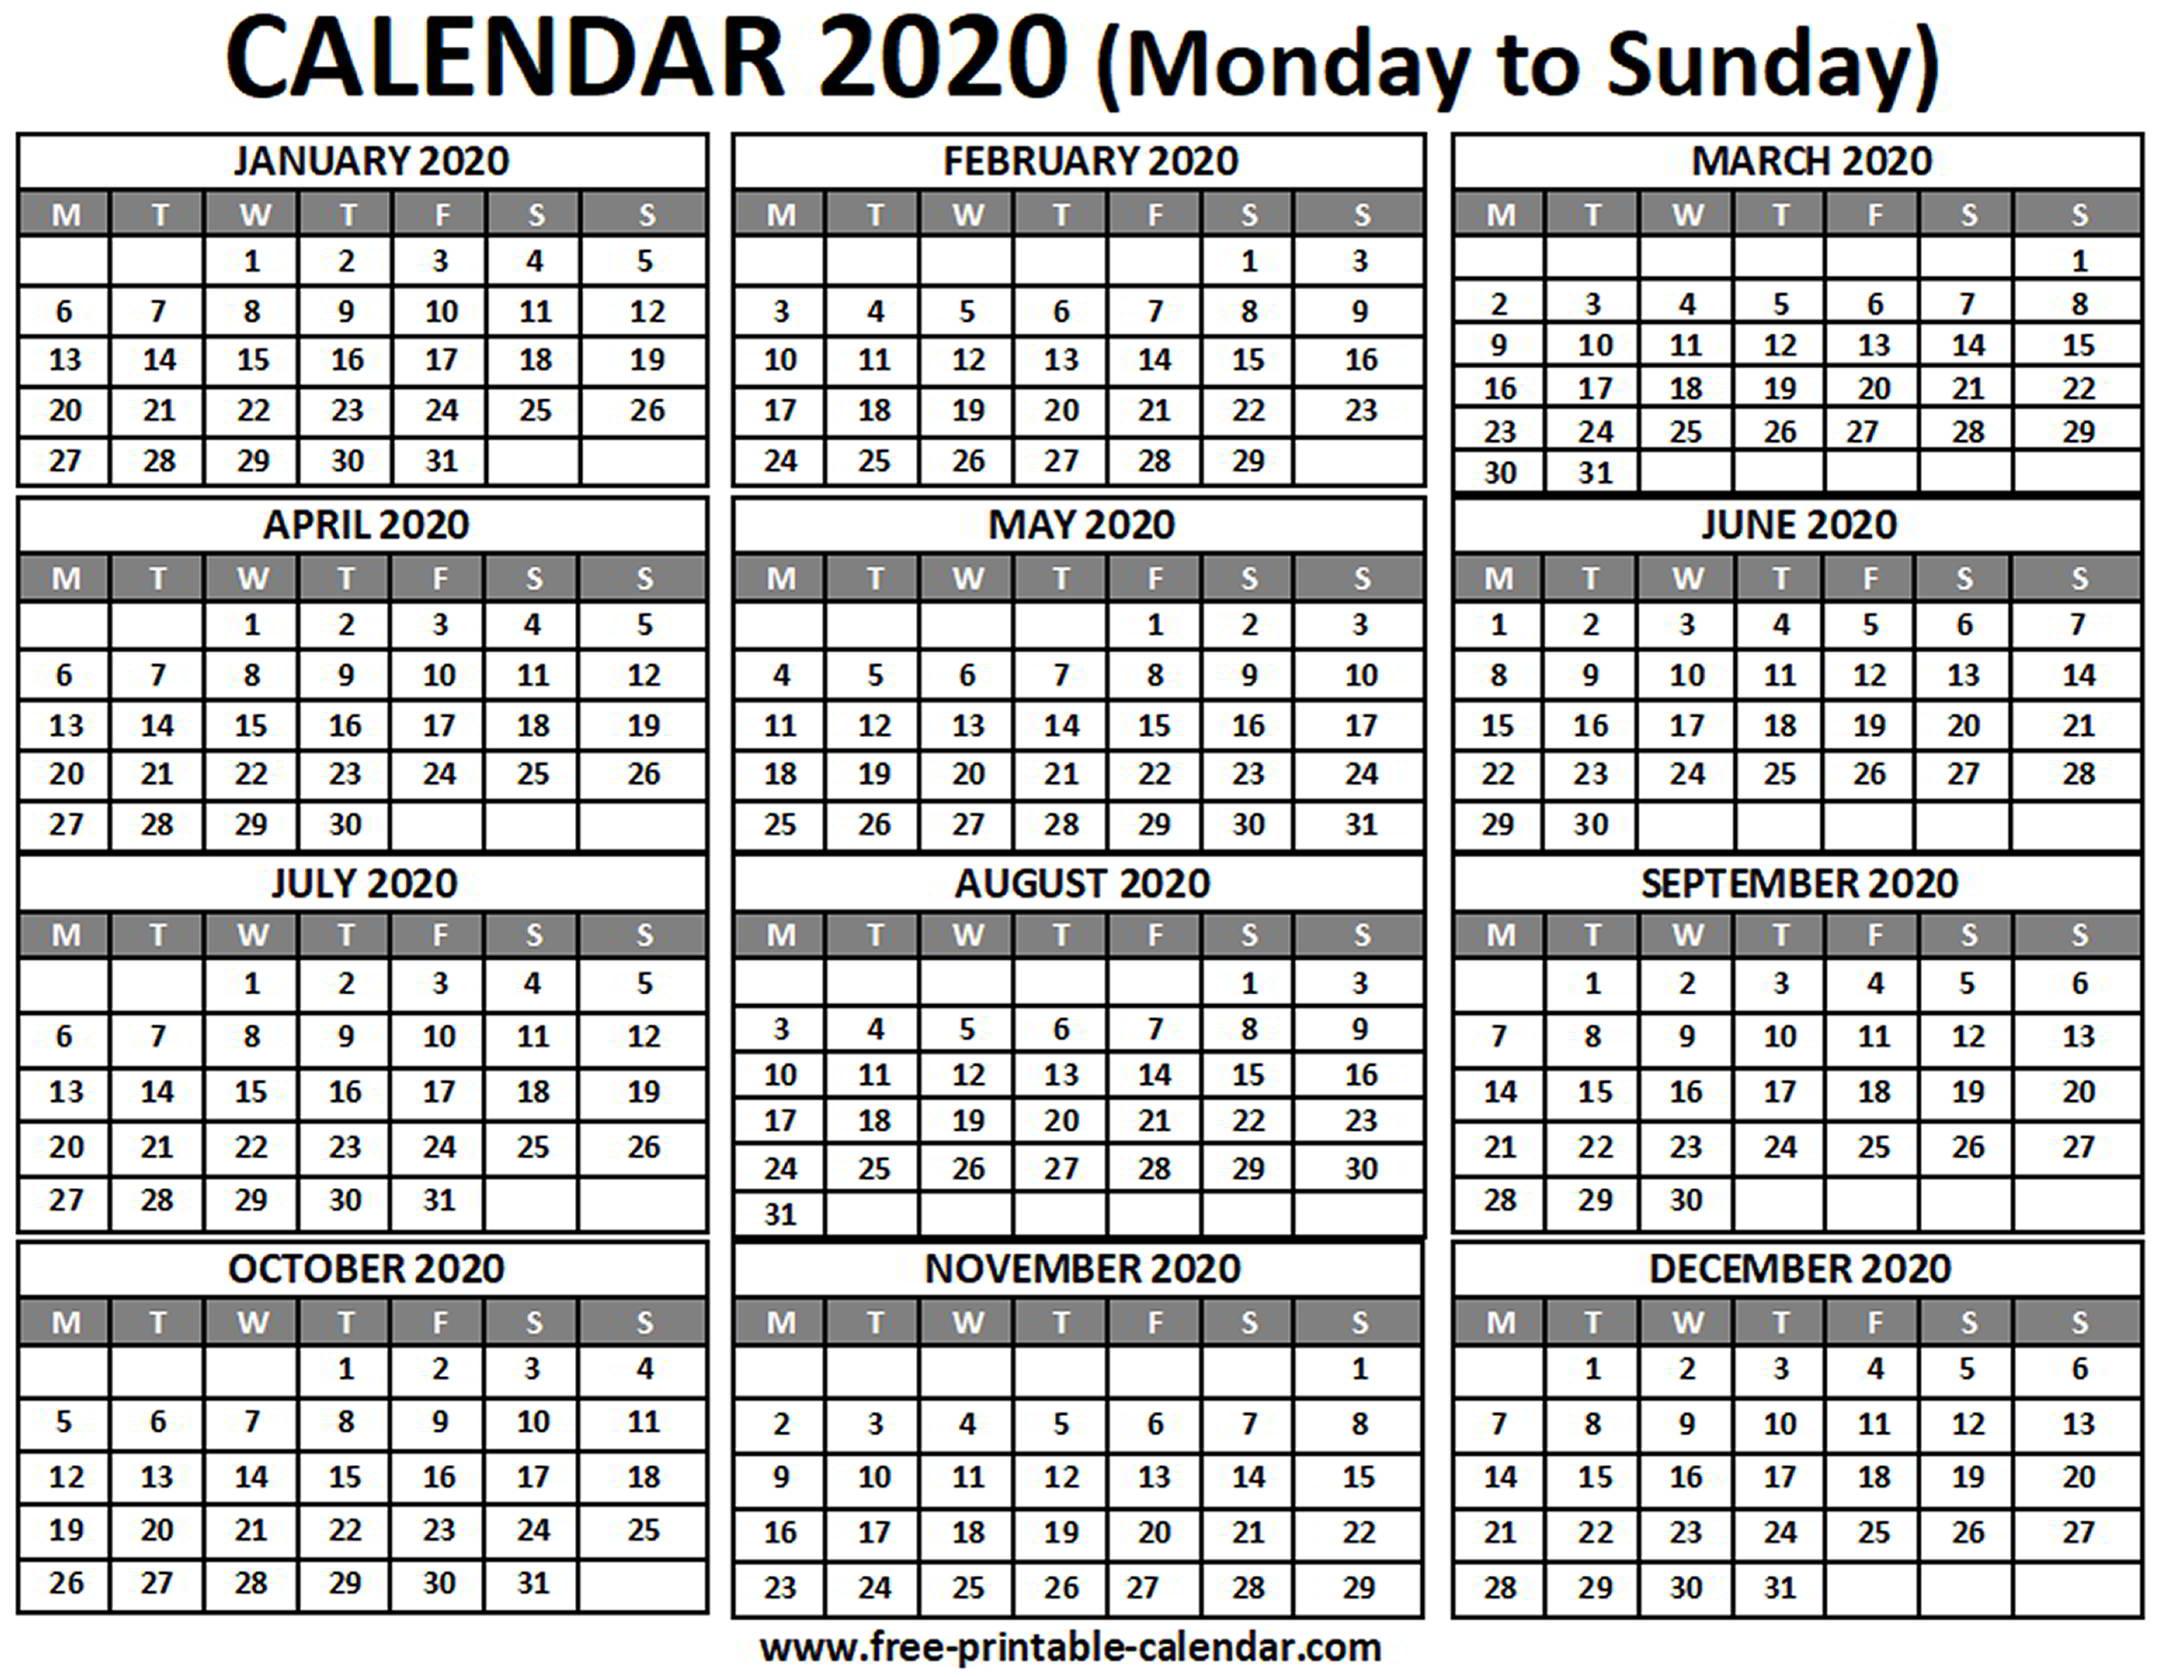 2020 Calendar - Free-Printable-Calendar with 2020 Calendar Starting With Monday